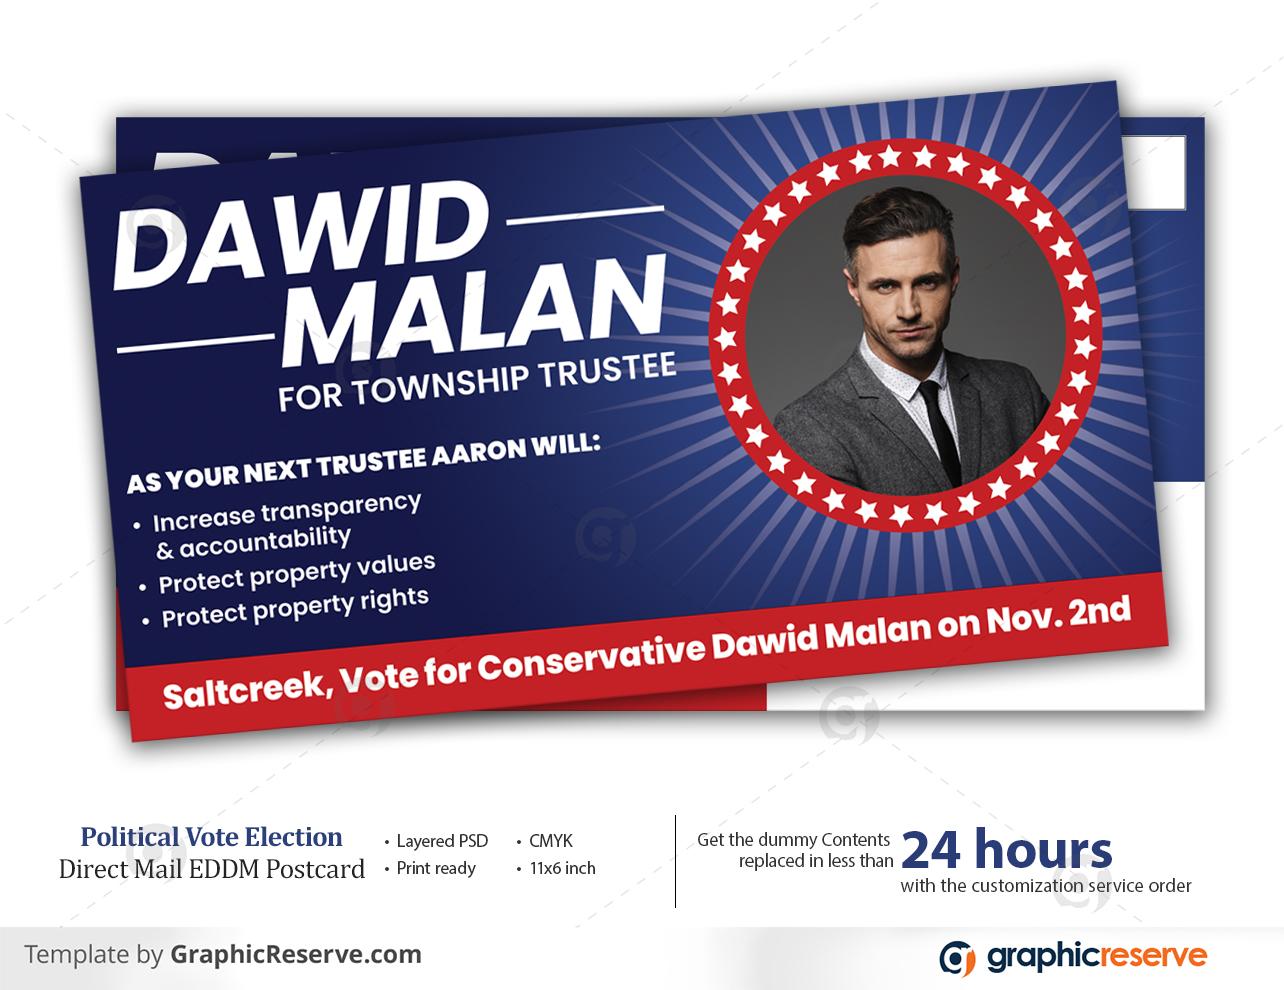 Political Vote Election Direct Mail EDDM Postcard